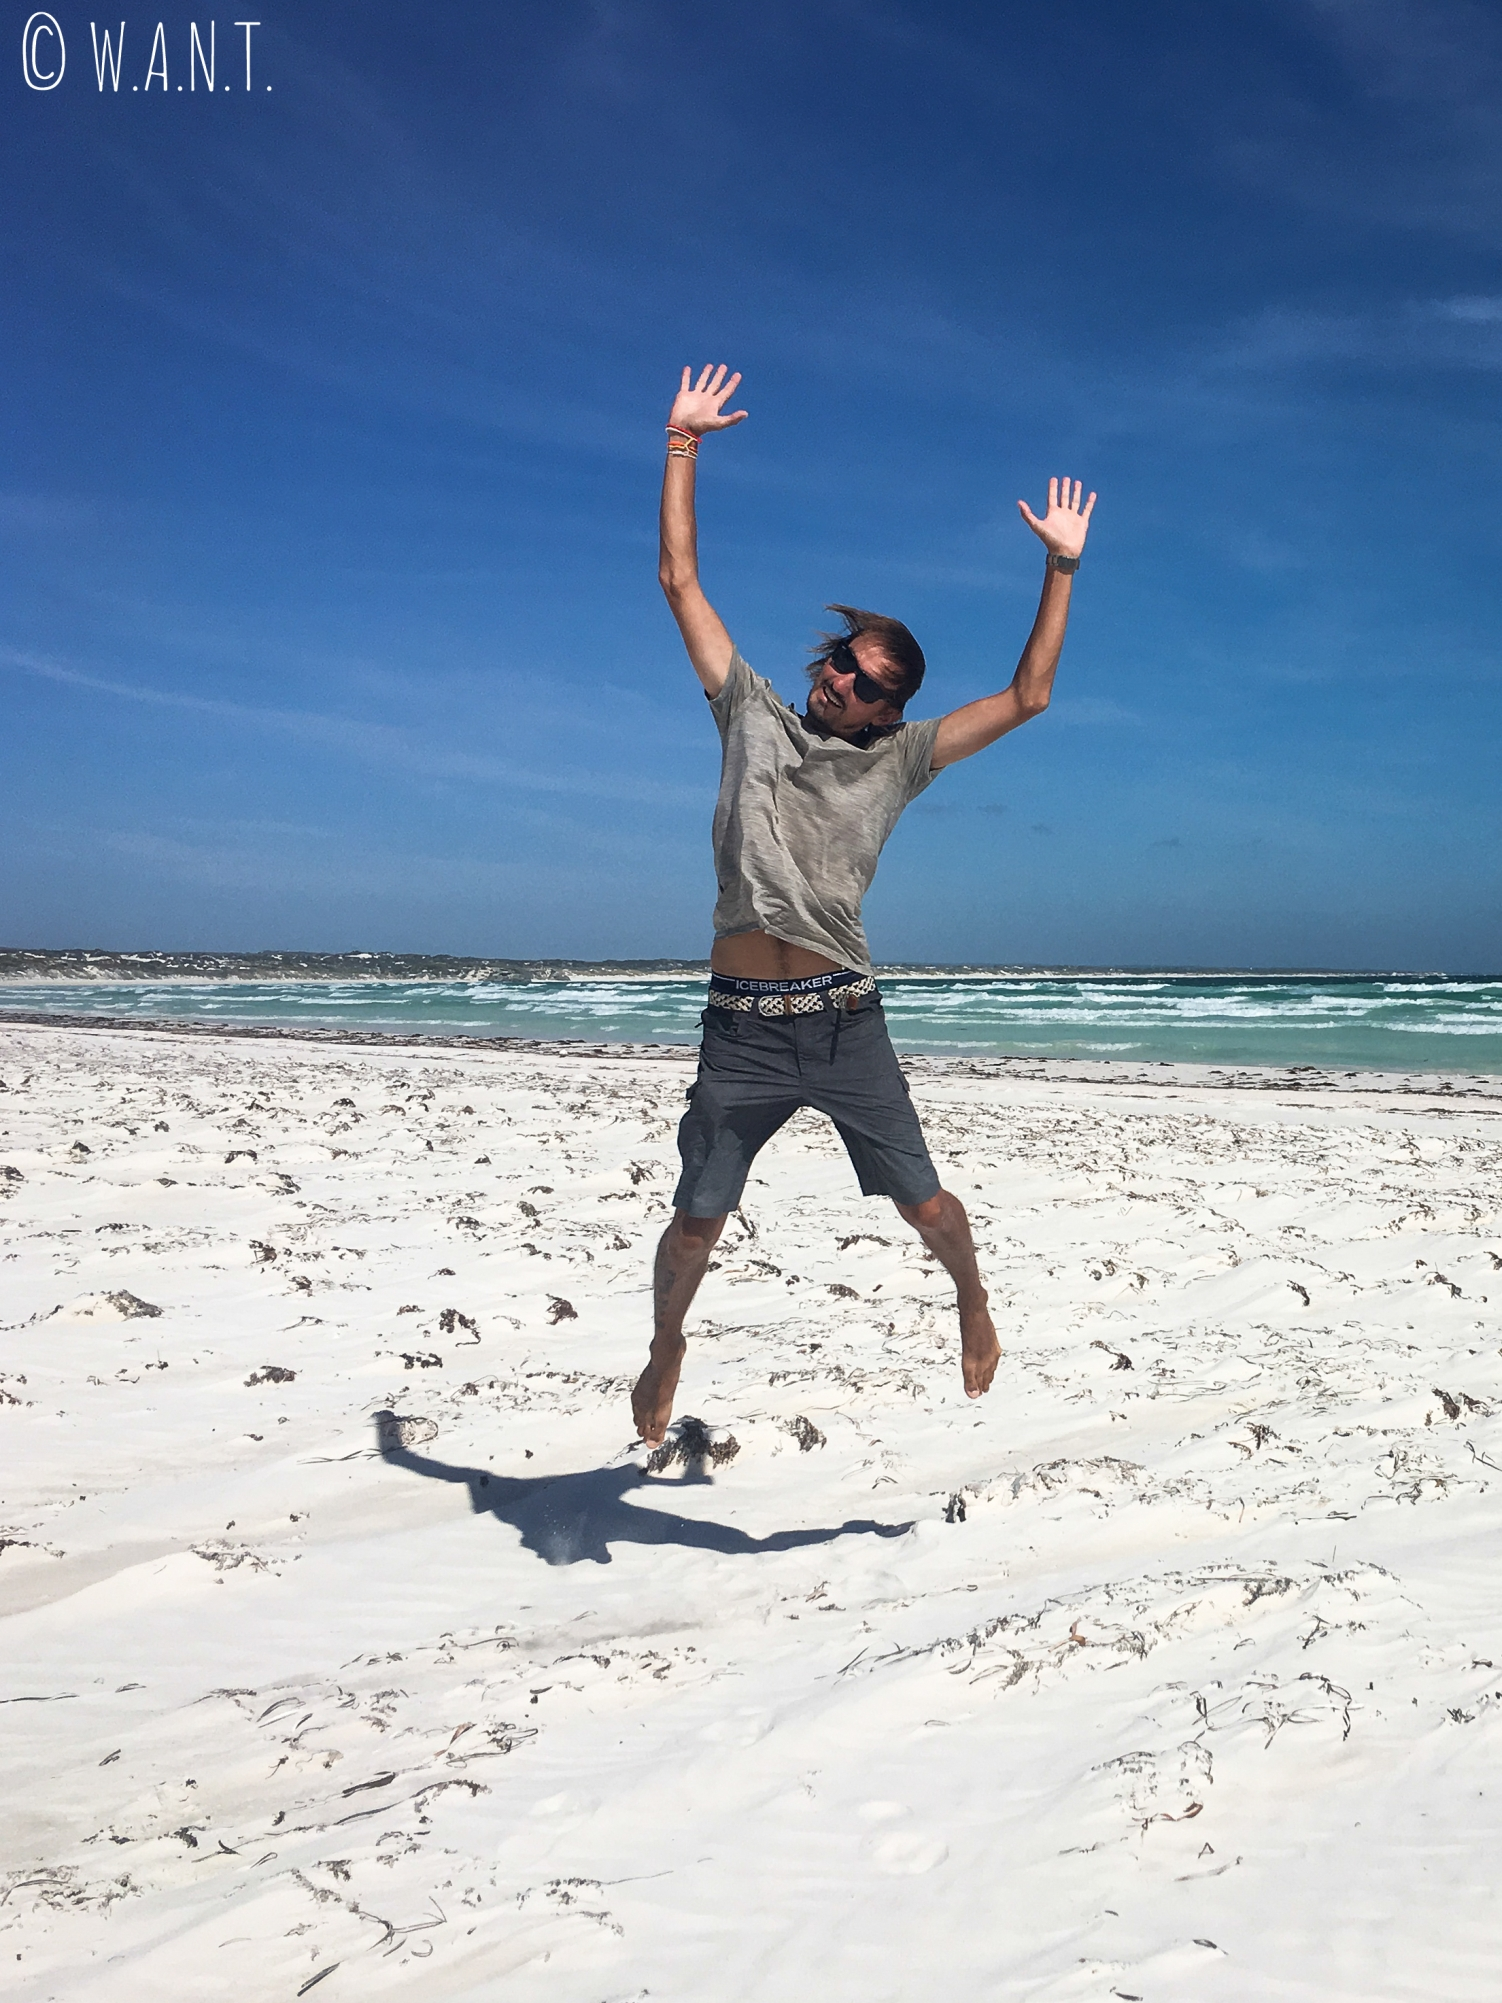 Benjamin dans le sable blanc de Wedge Island au nord de Perth